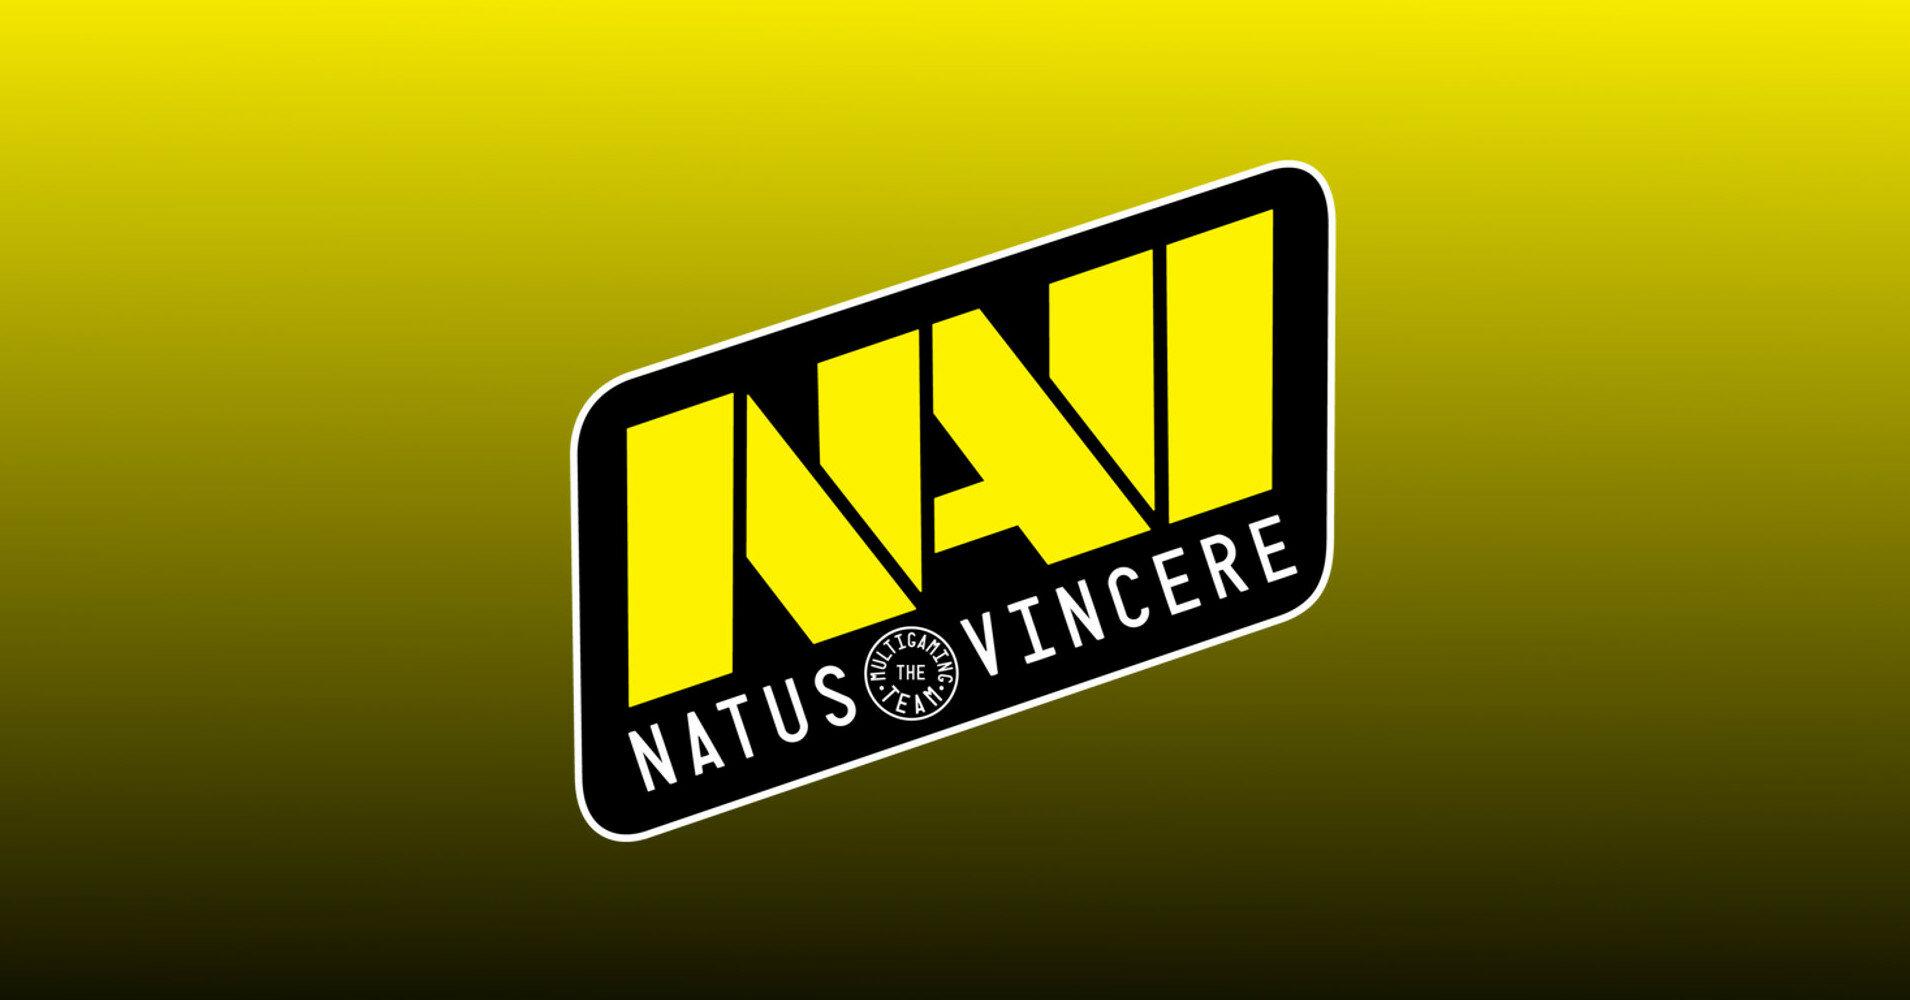 Команда Natus Vincere Junior завершила участие в турнире WePlay Academy League Season 1